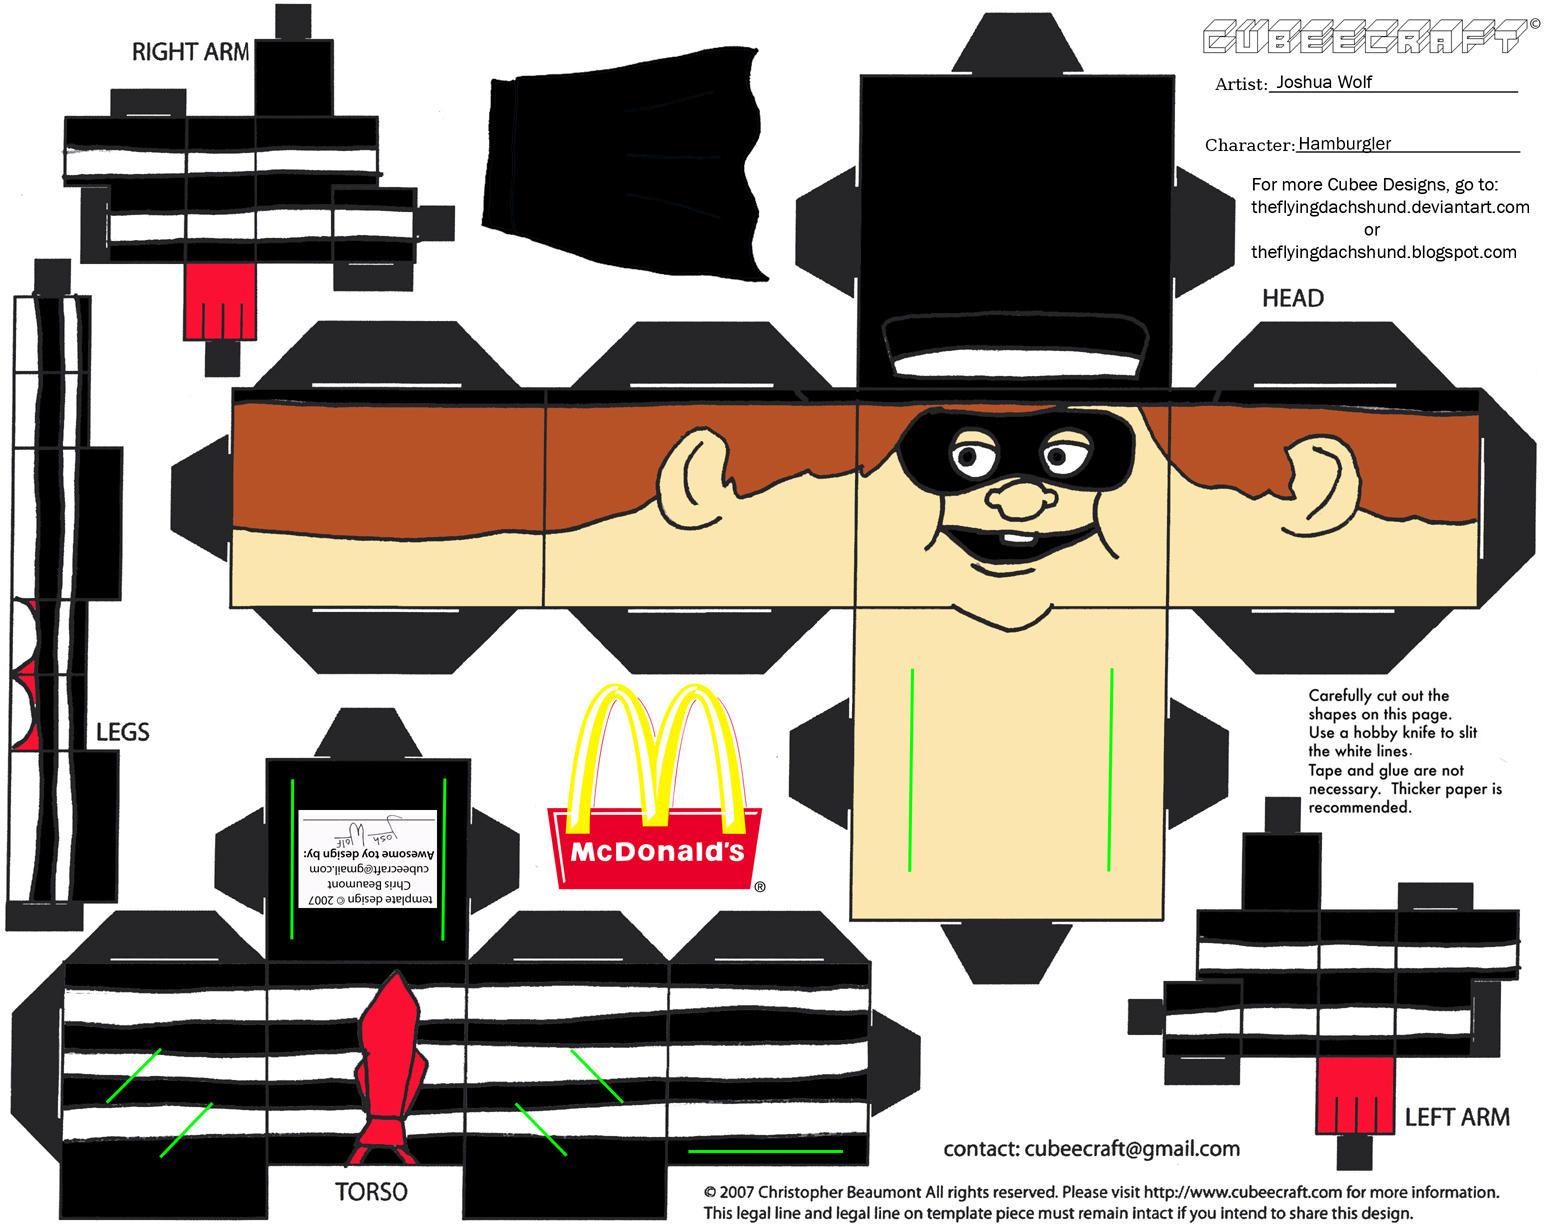 [Jeu] Association d'images - Page 19 Adv_ch_3__hamburglar_cubee_by_theflyingdachshund-d33z8gp